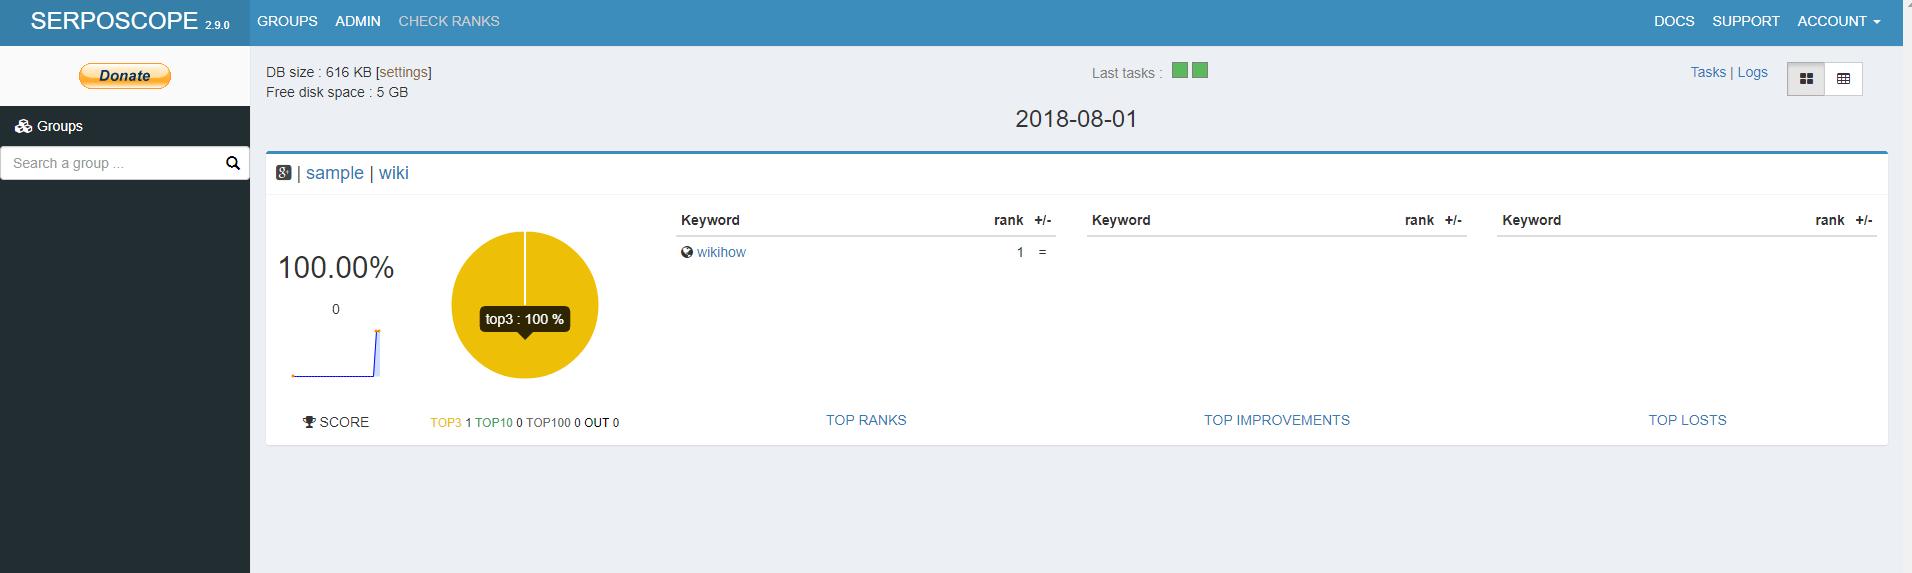 how to use serposcope, seo ranking tool, serp ranking tool, Serposcope download, Serposcope github, serposcope install, Serposcope review